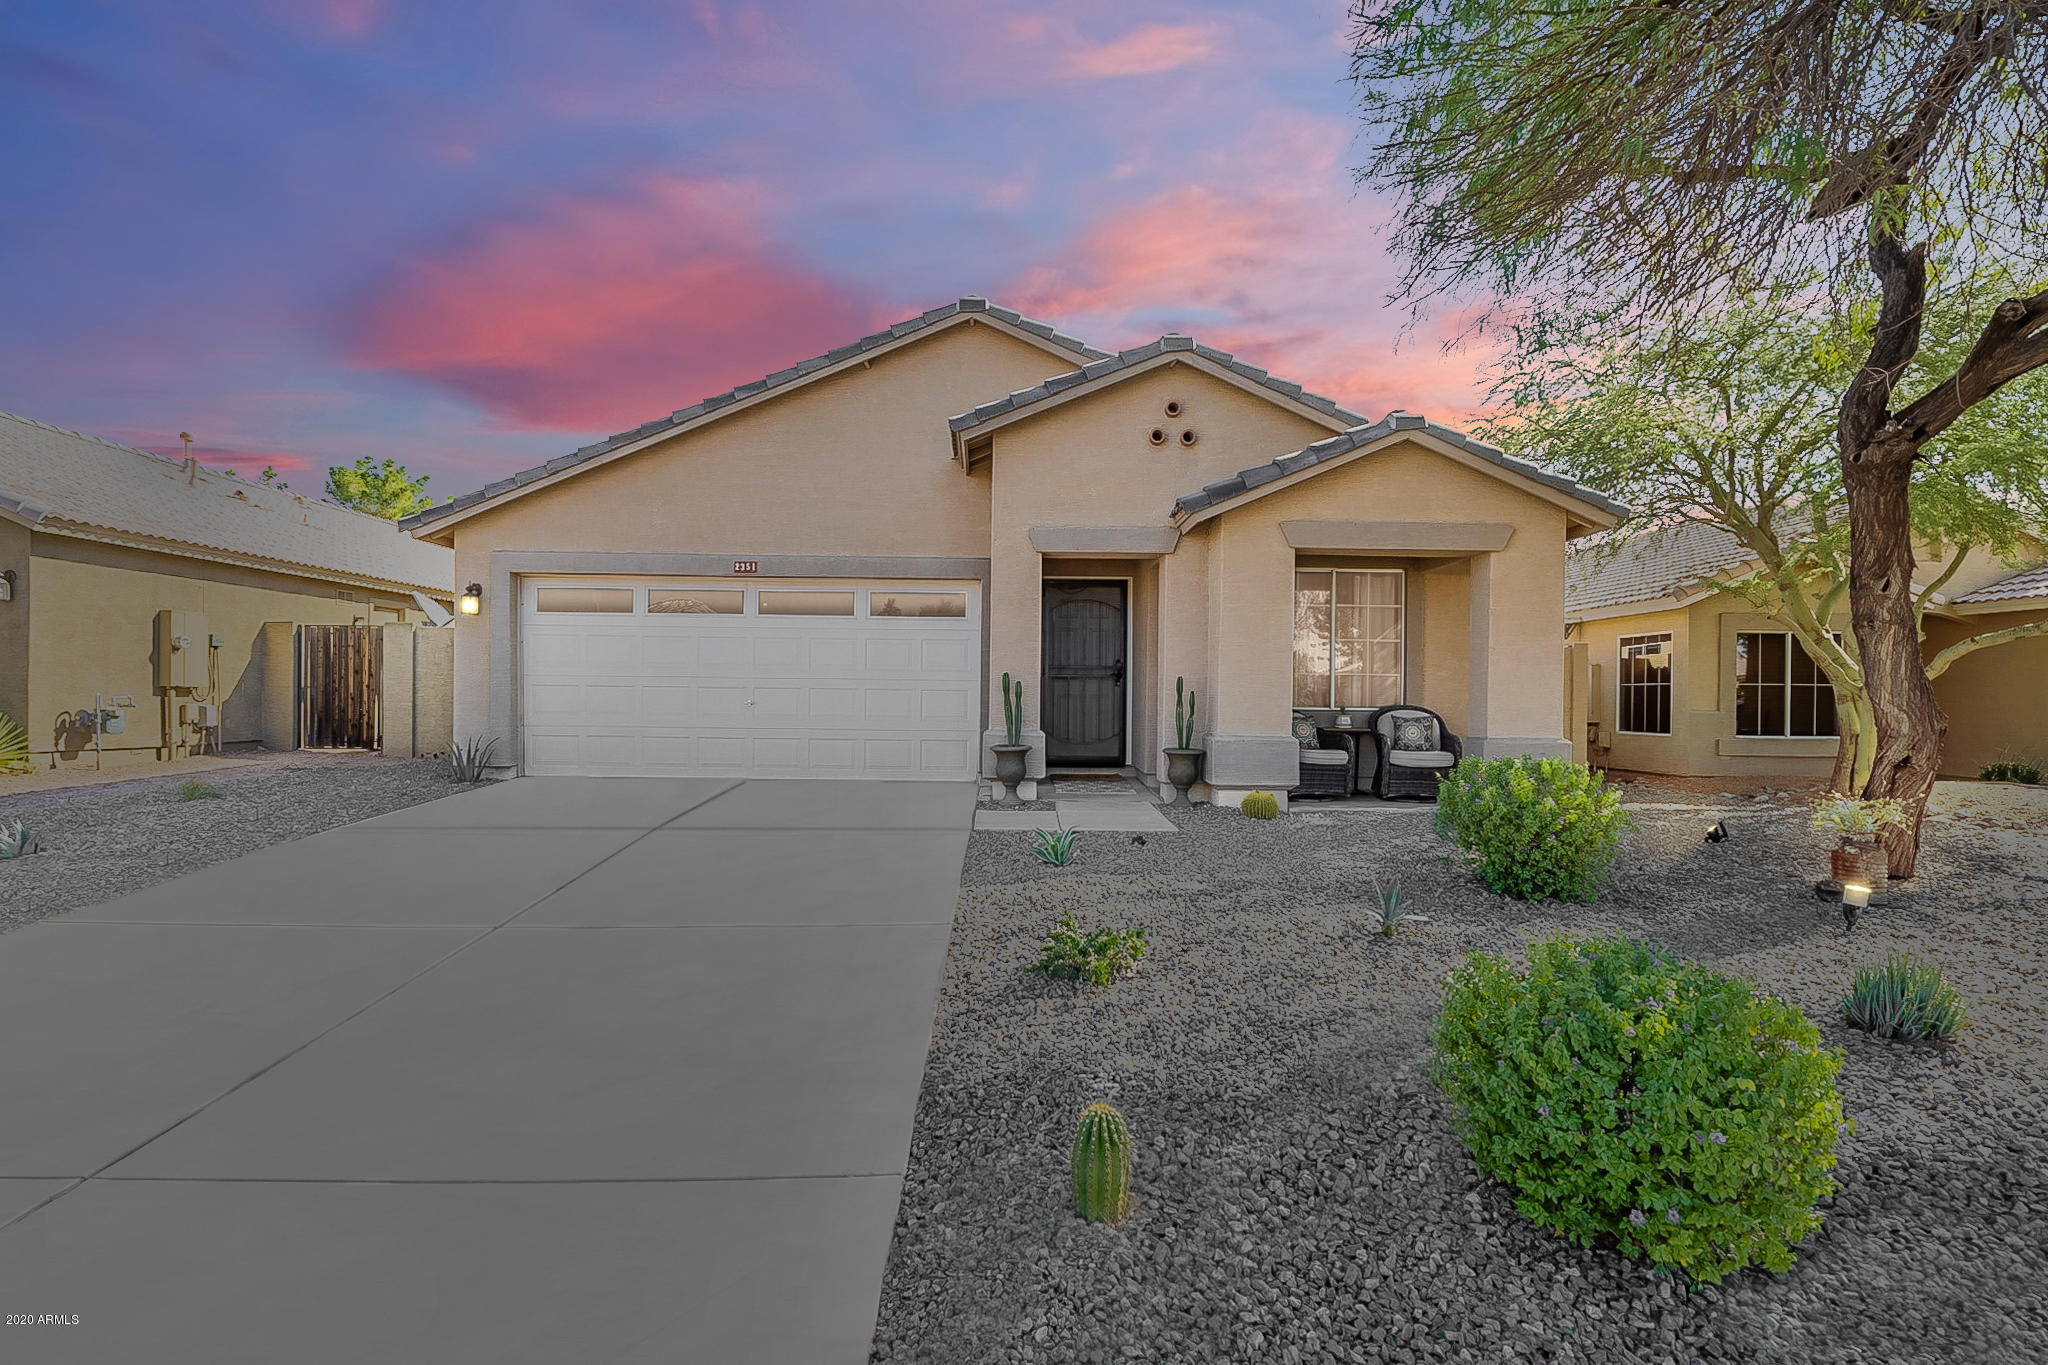 2351 S COMPTON Avenue, Mesa, AZ 85209, 3 Bedrooms Bedrooms, ,Residential Lease,For Rent,2351 S COMPTON Avenue,6155723